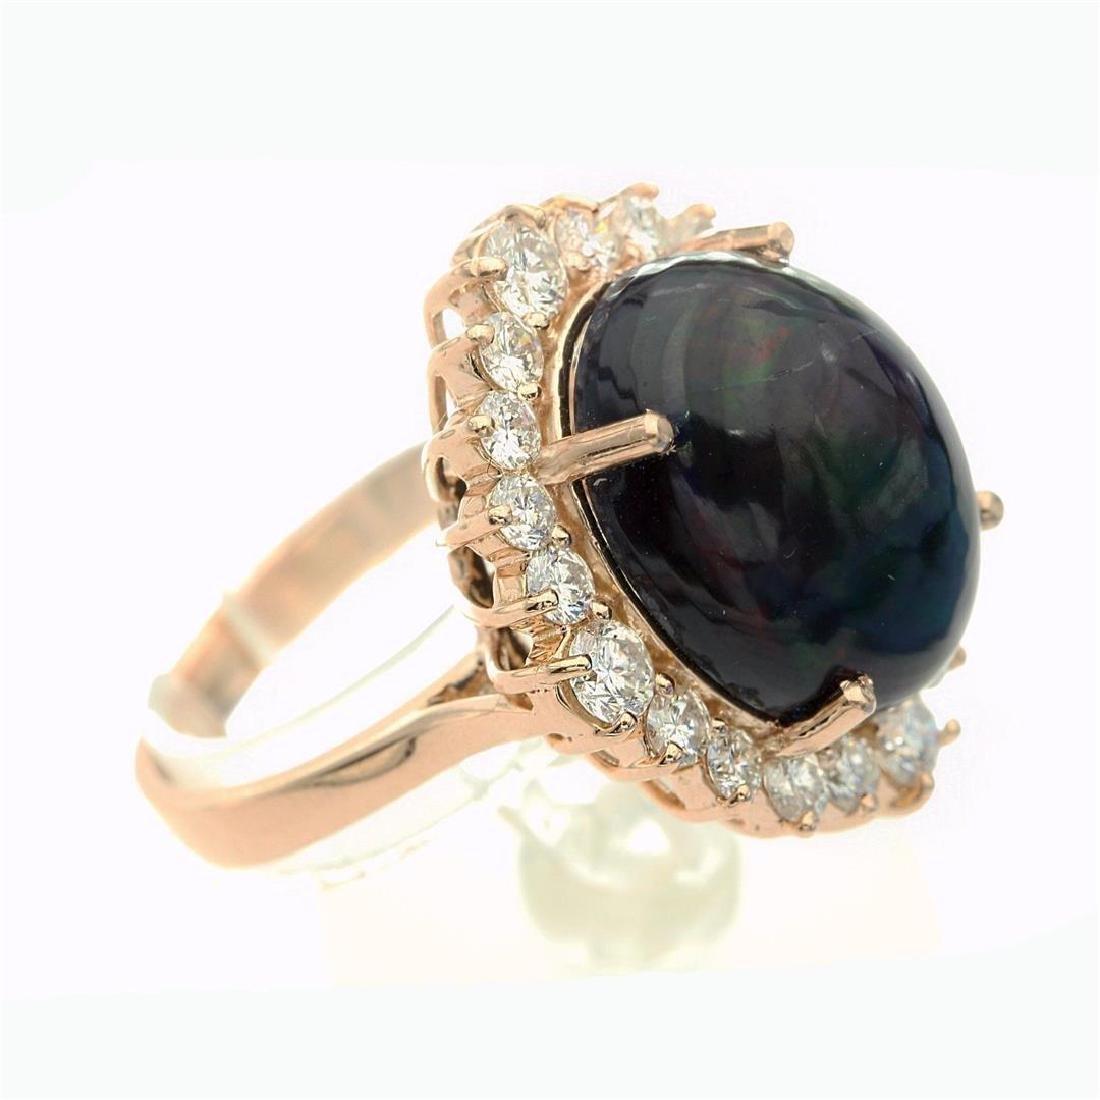 7.46 Carat Natural Diamonds & Opal Anniversary Ring in